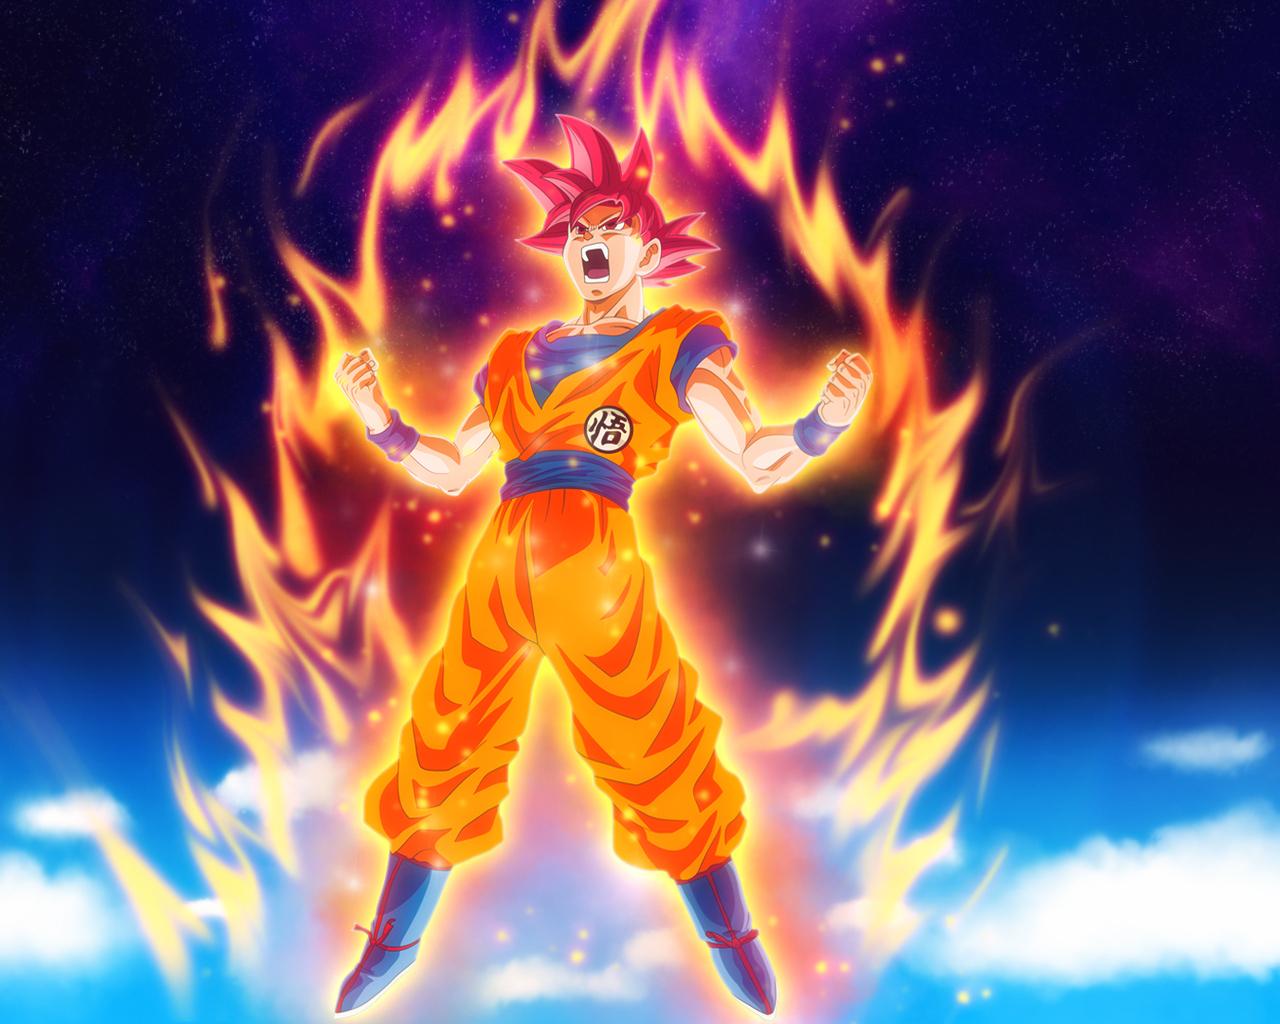 Goku Dragon Ball Super Anime Hd De